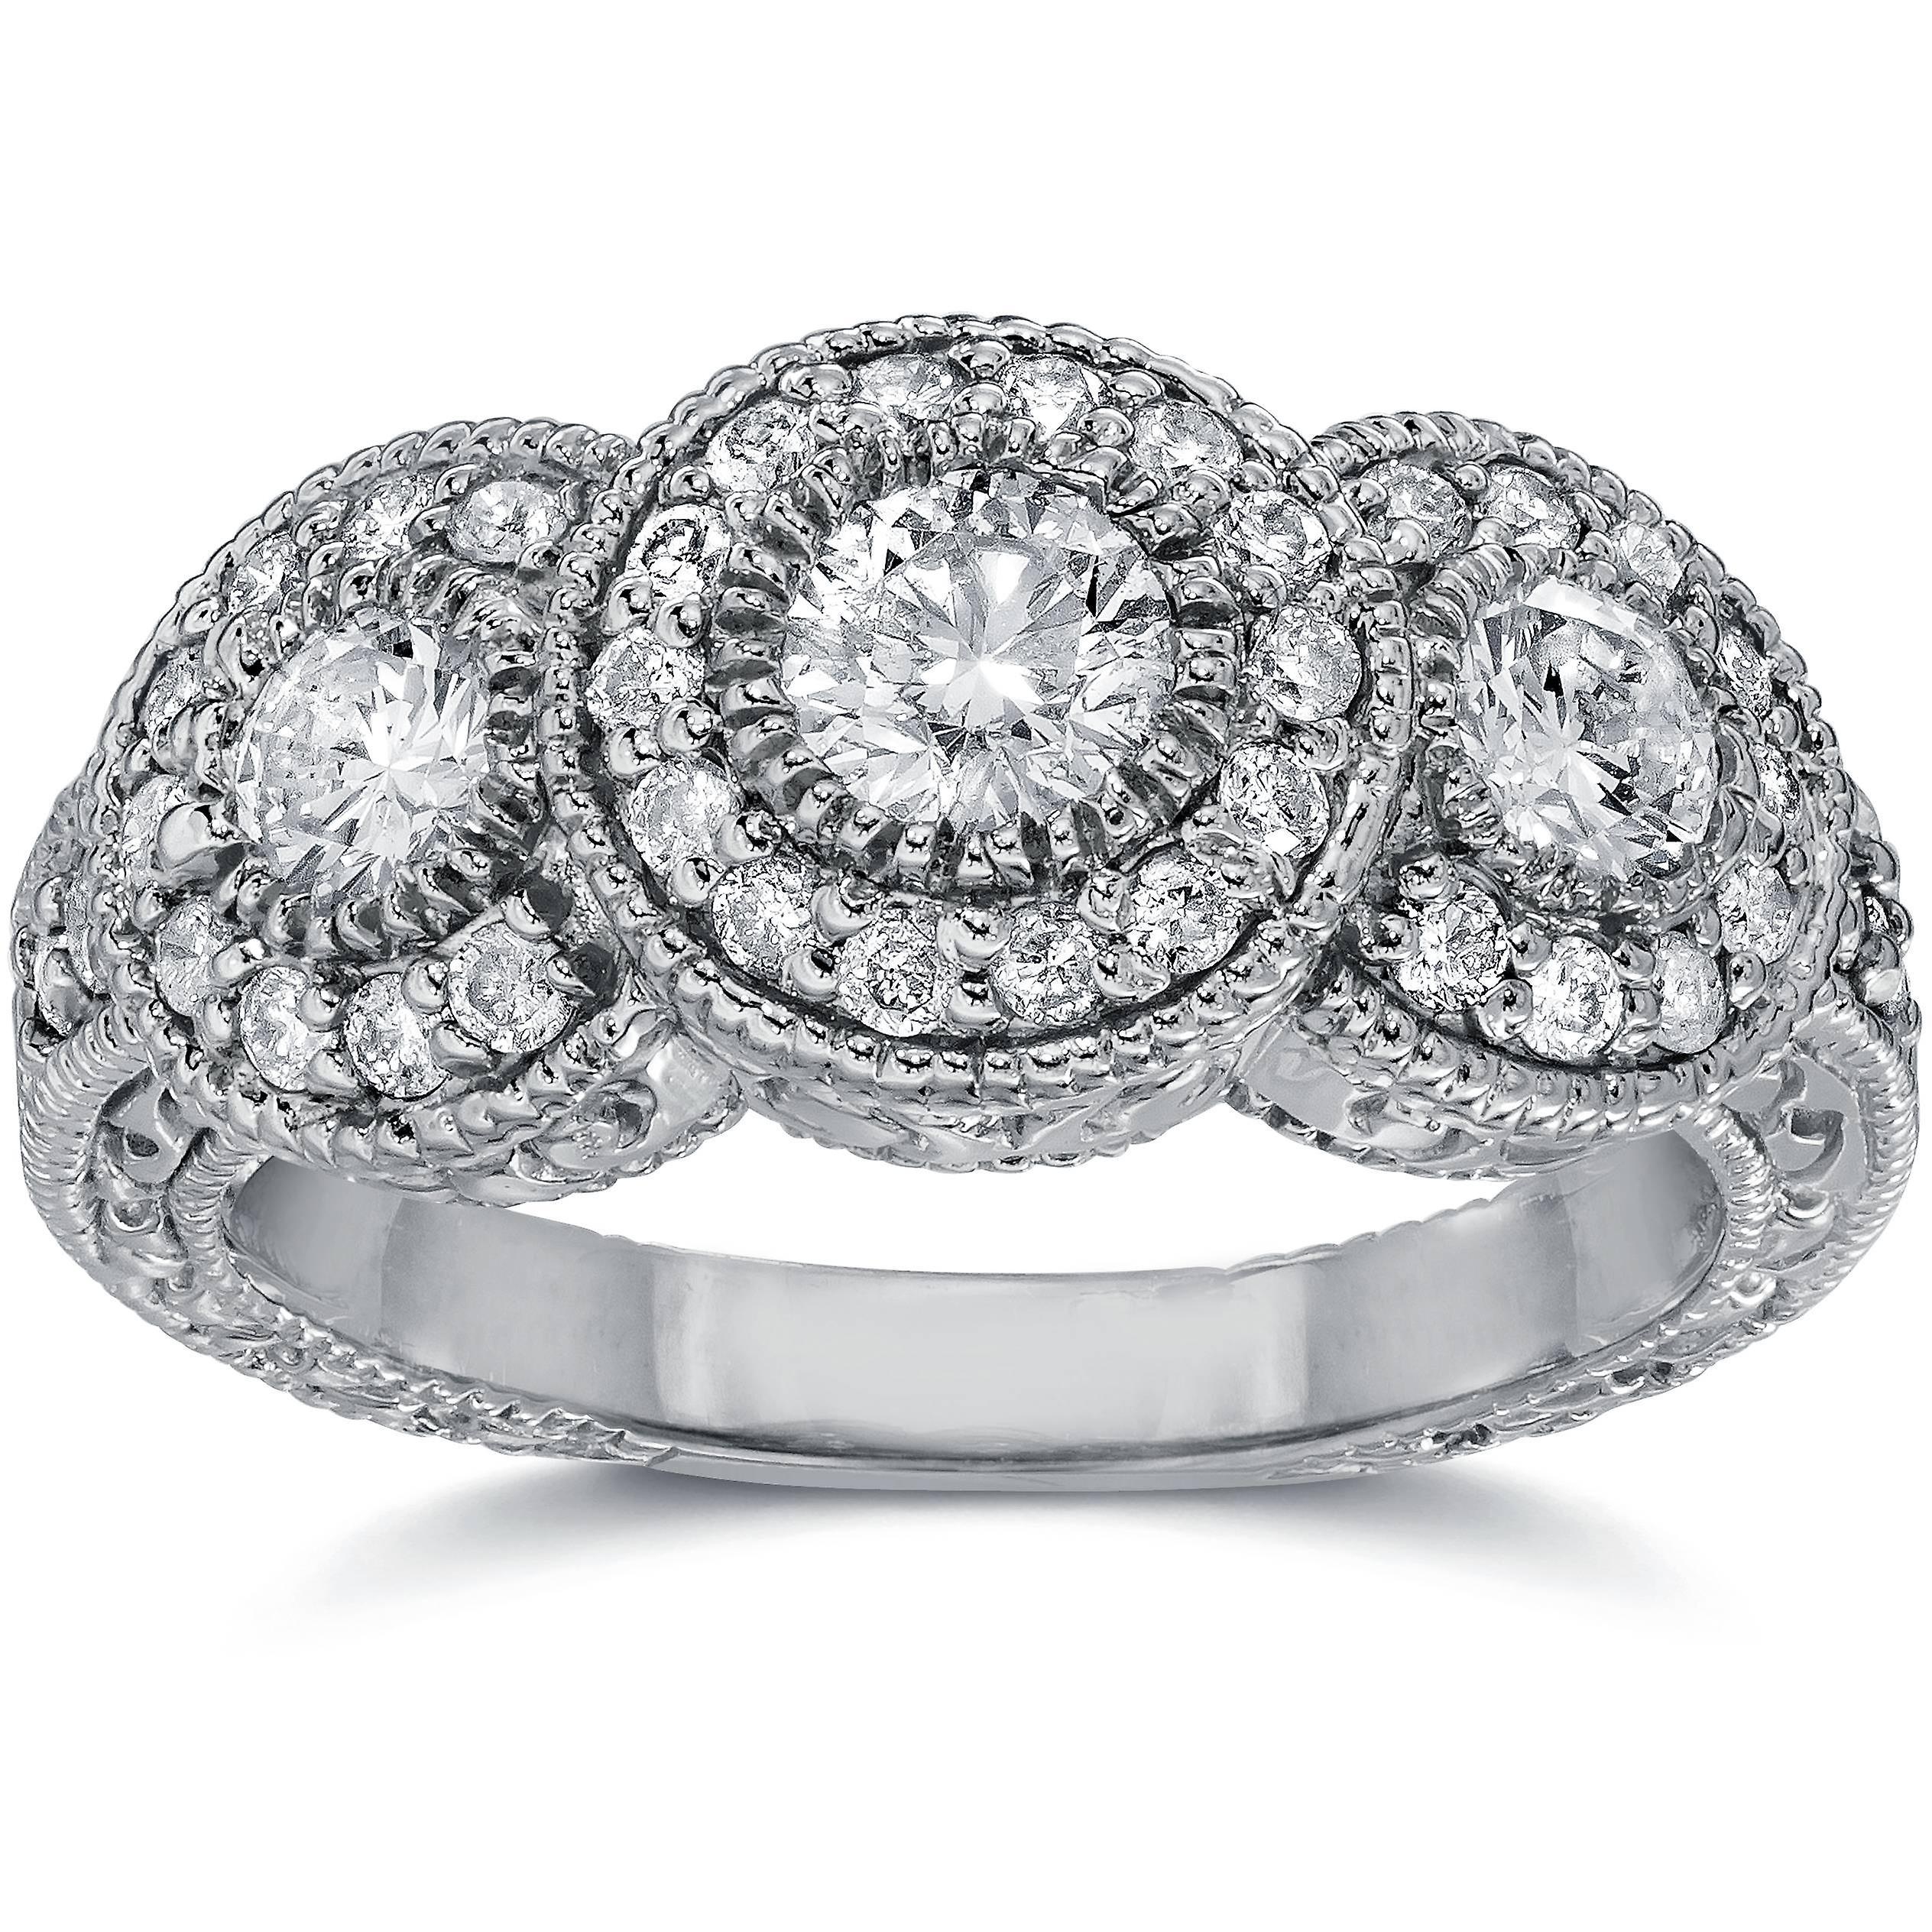 1 1 2ct Vintage Three Stone Lab Created Diamond Engagement Ring 14K blanc or